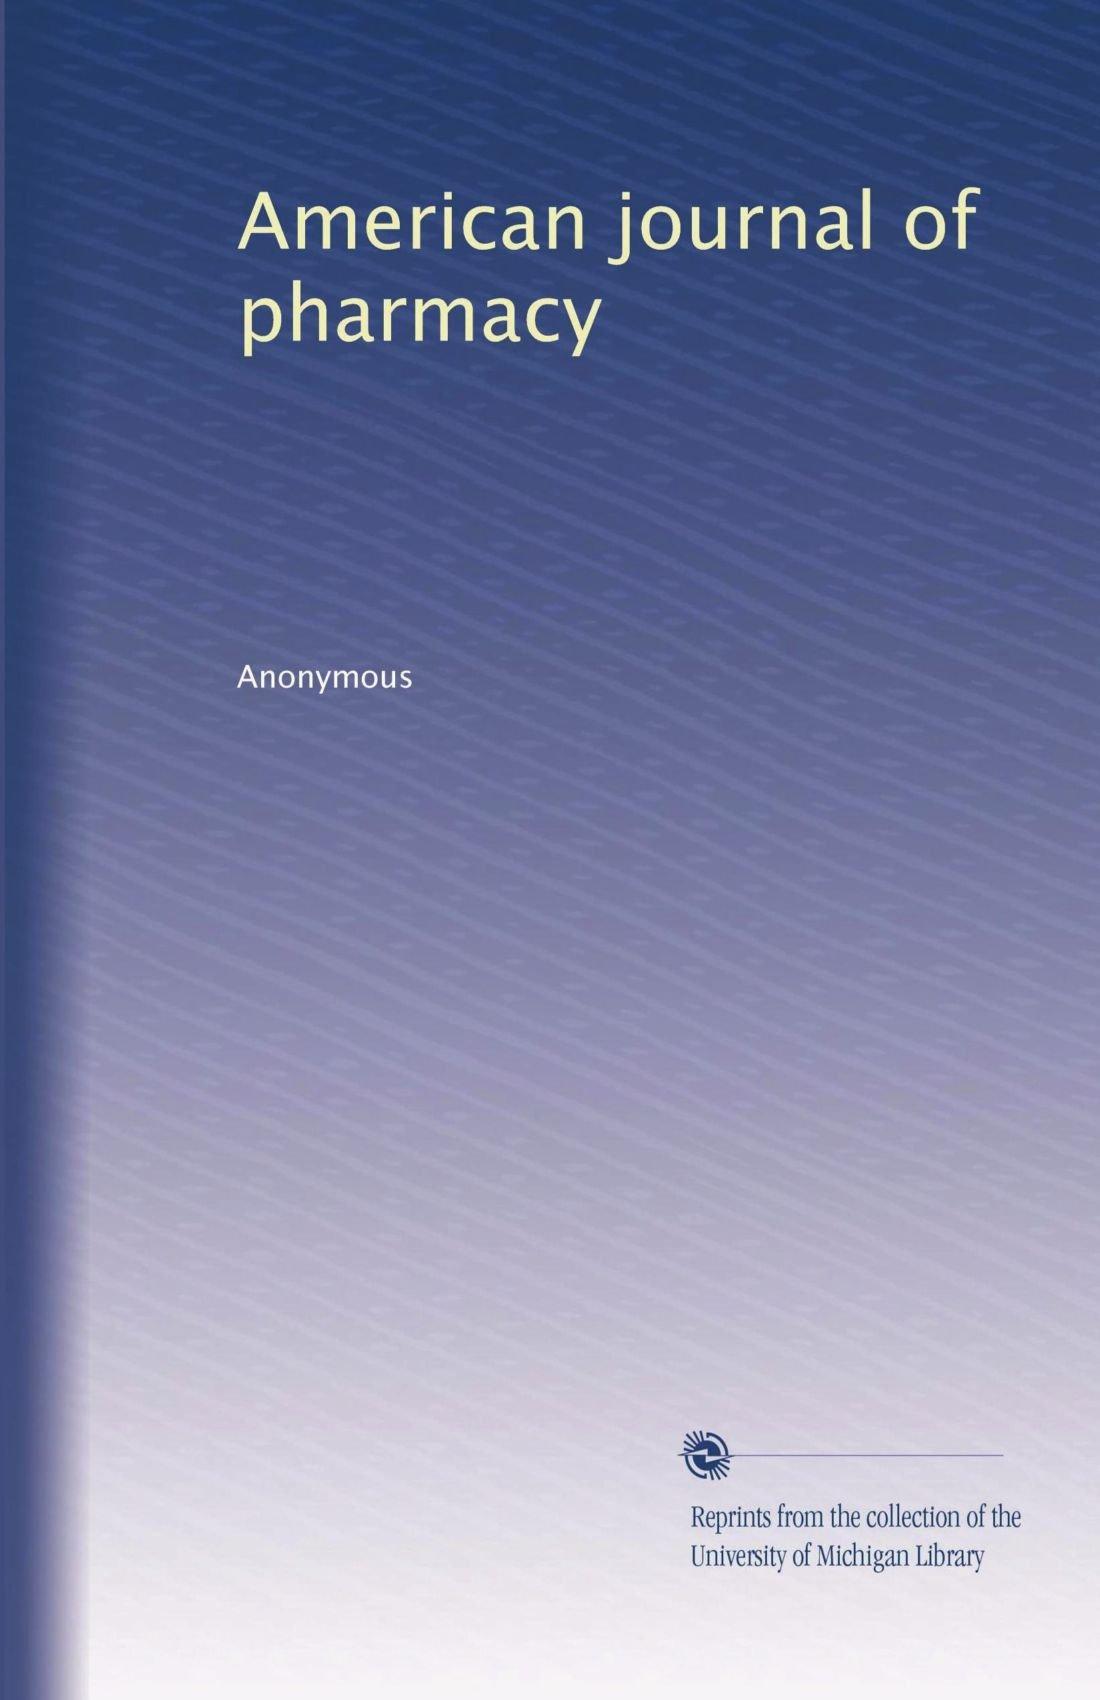 Download American journal of pharmacy (Volume 34) pdf